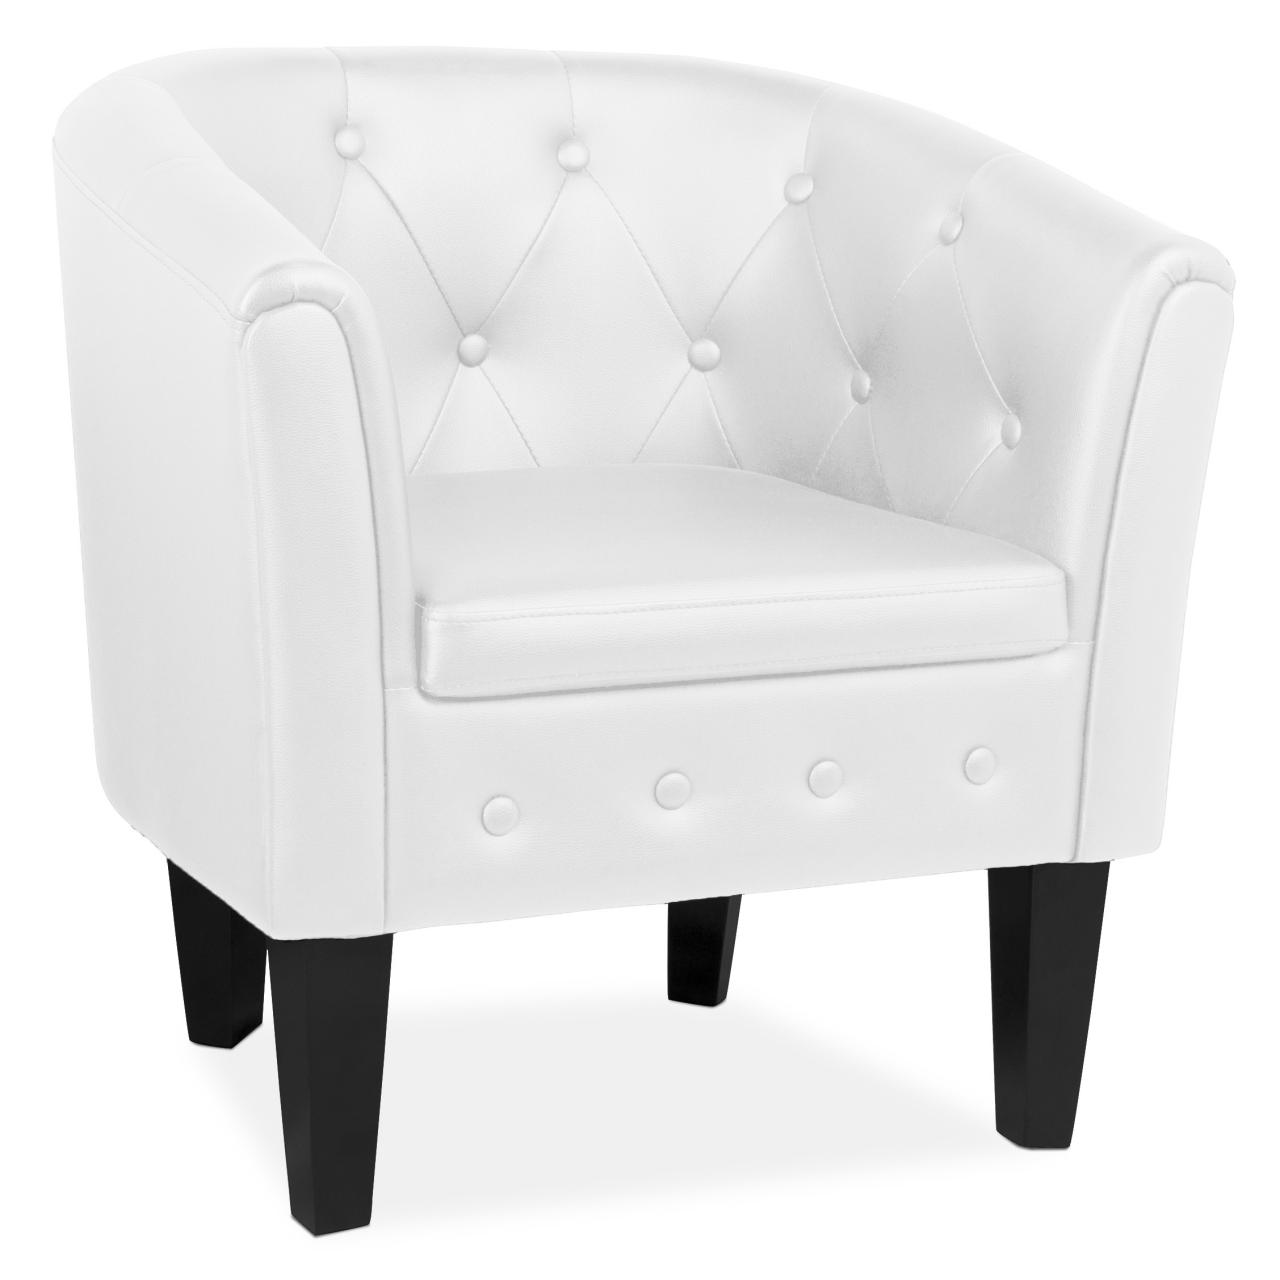 White chesterfield chair - Chesterfield Chair Club Cocktail Armchair Lounge Sofa Seat